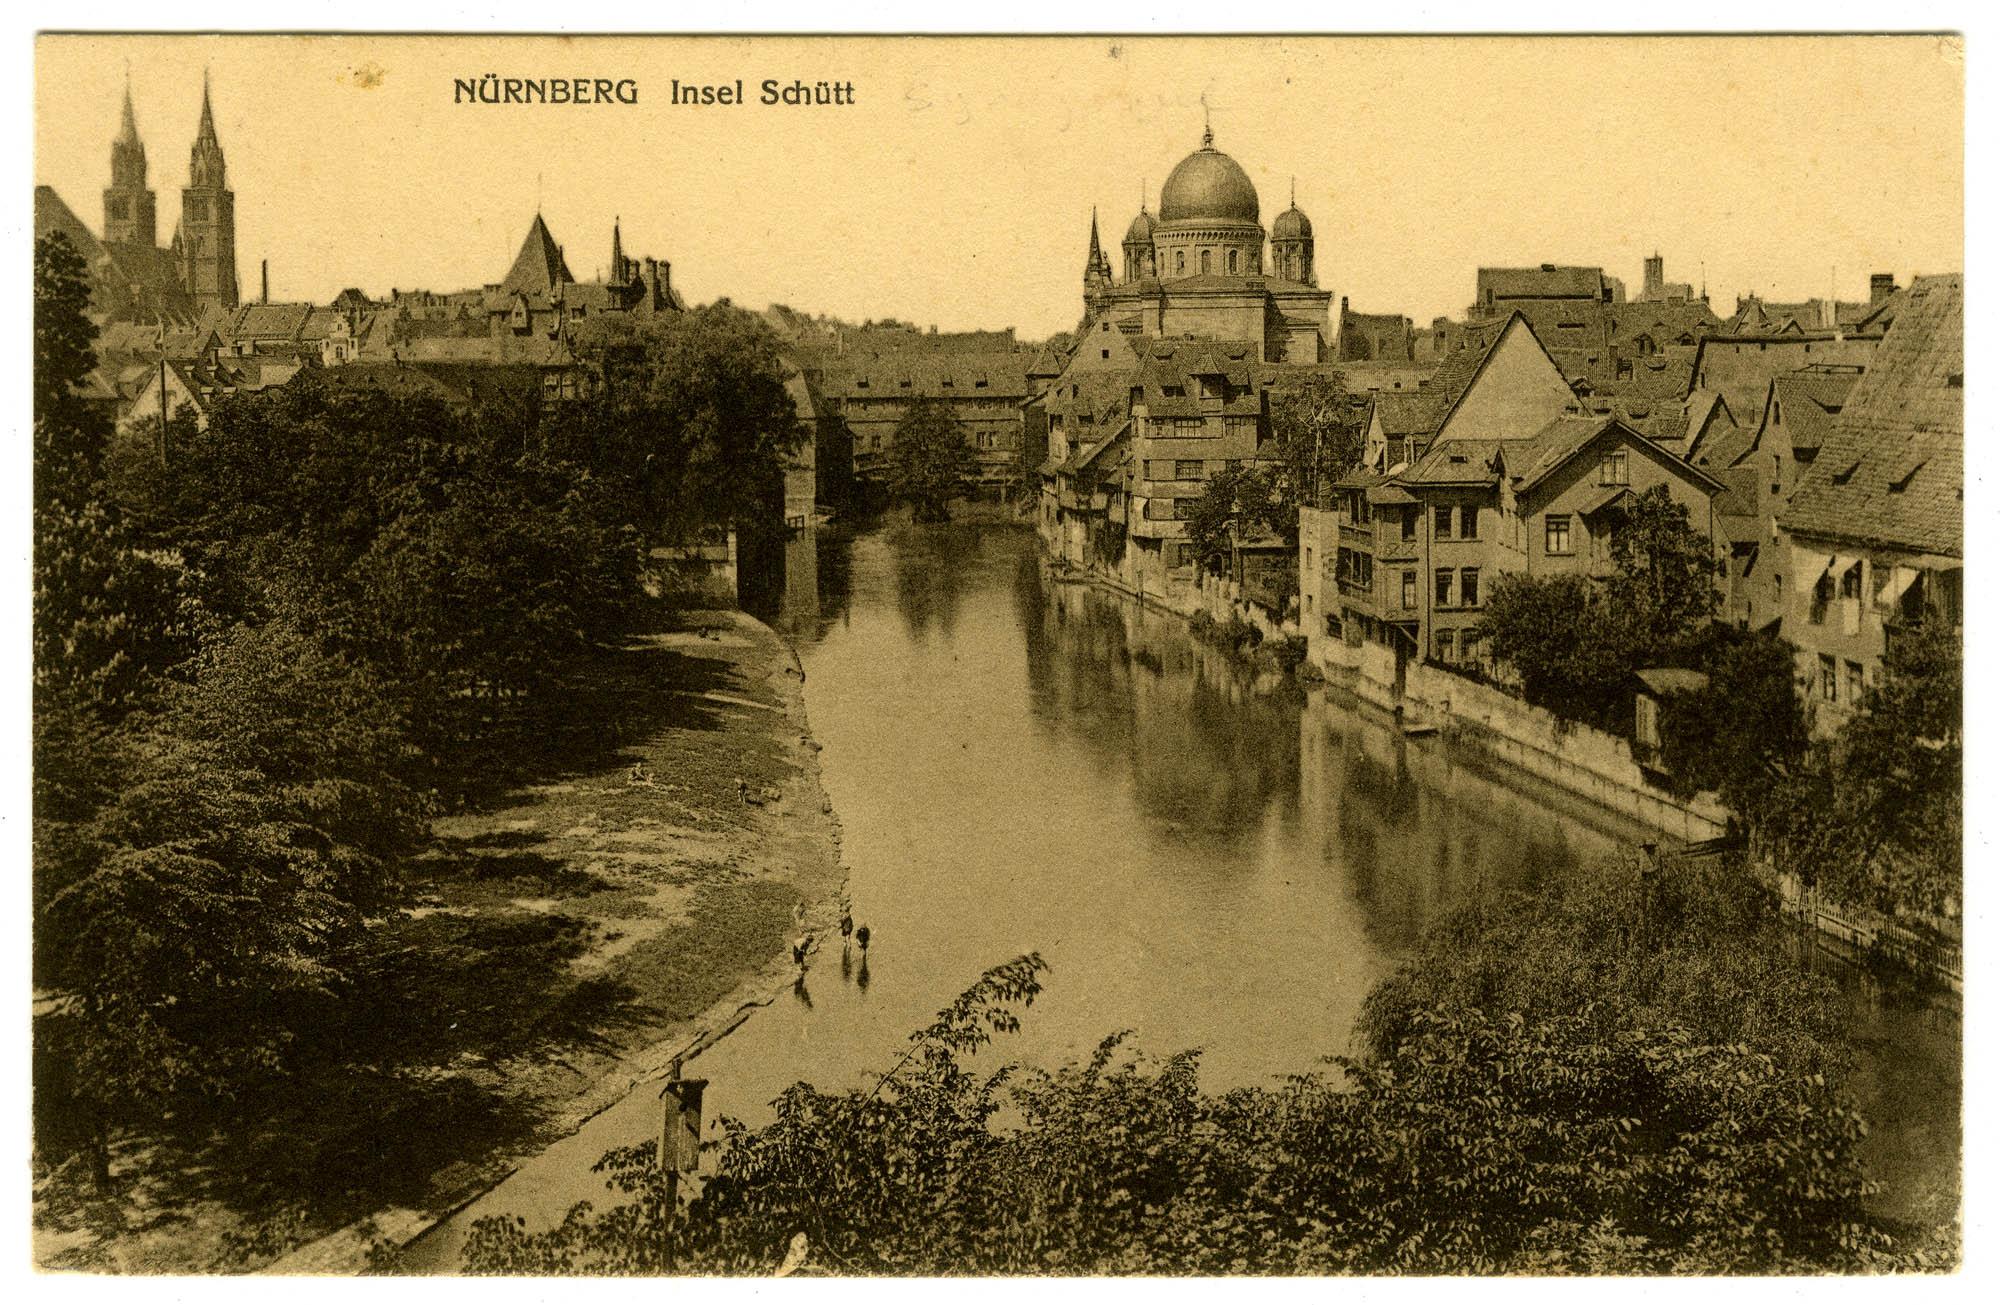 Nürnberg, Insel Schütt